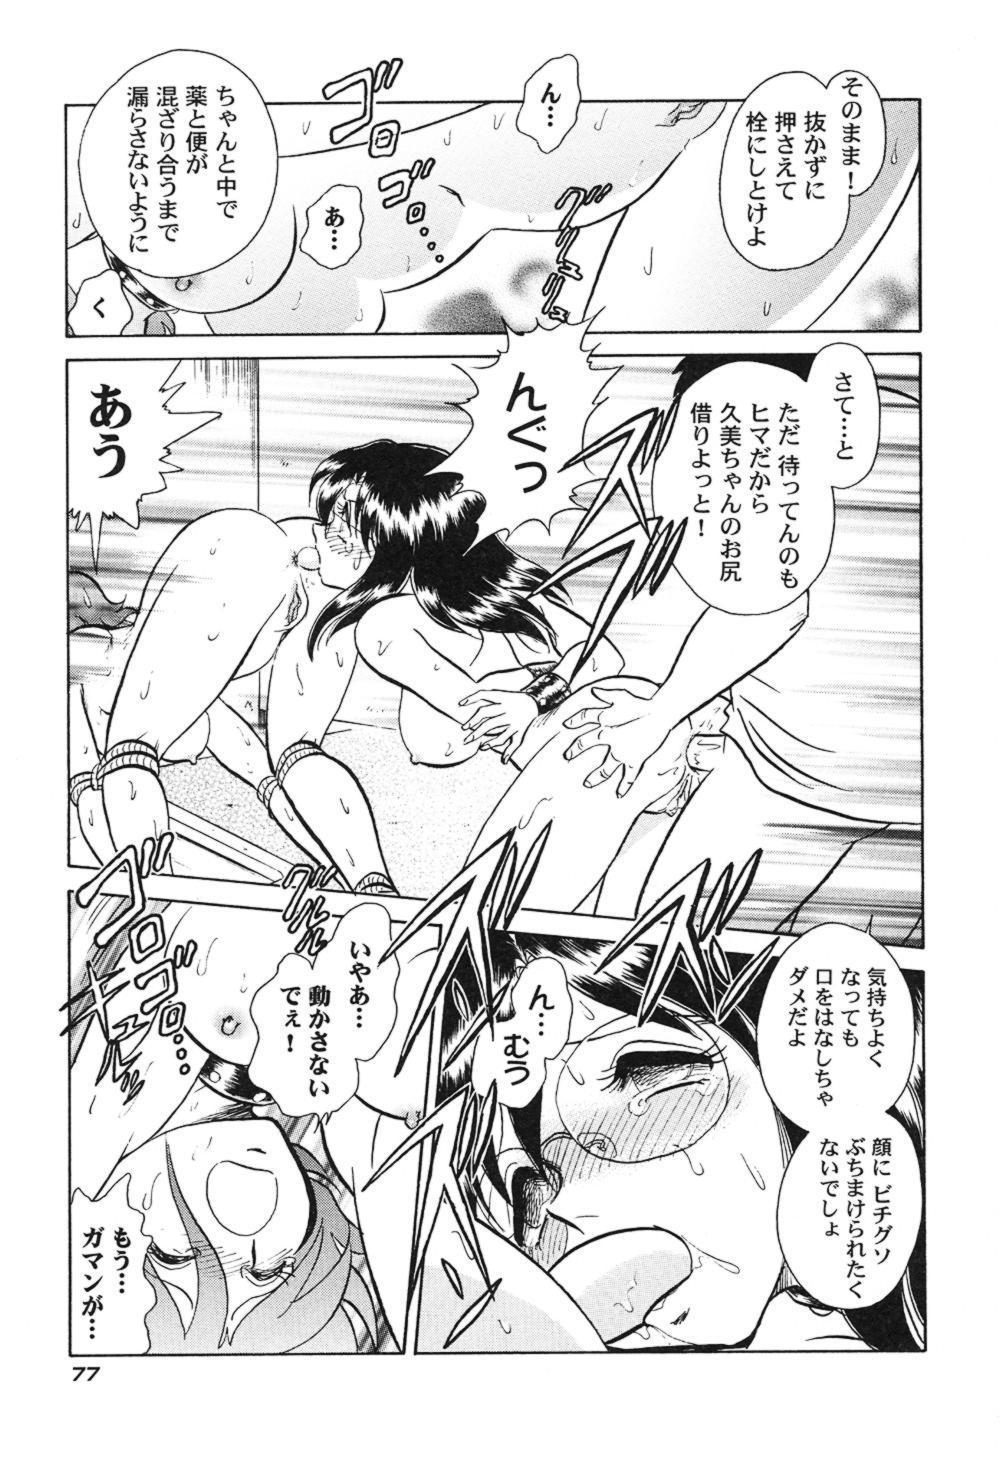 Hageshii Kagai Jugyou 79